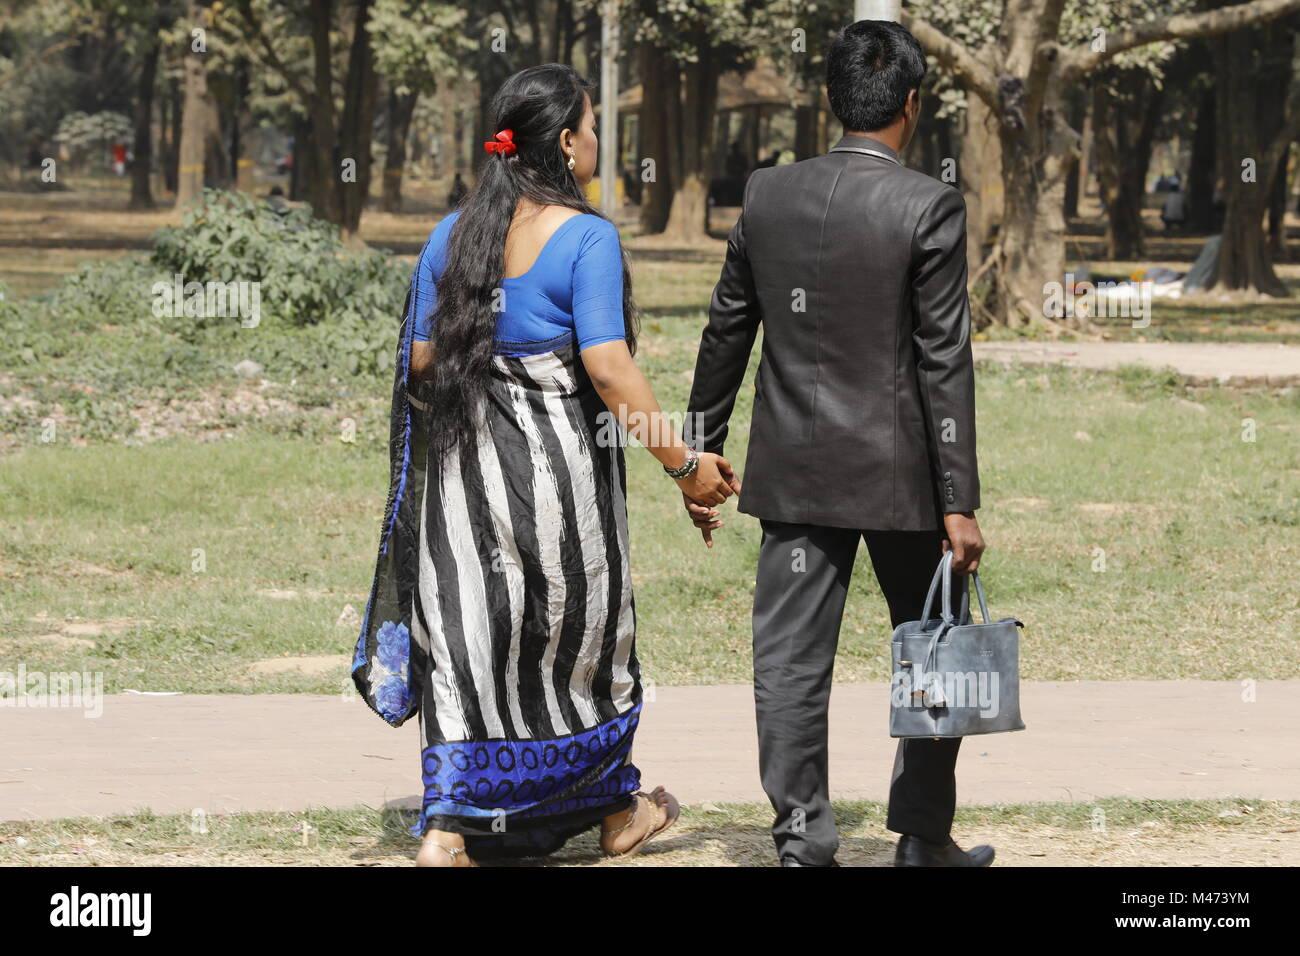 Dhaka, Bangladesch. Februar 14, 2018. Bangladeshi Paar in einem Park zum Valentinstag in Dhaka am 14. Februar 2018 Stockbild